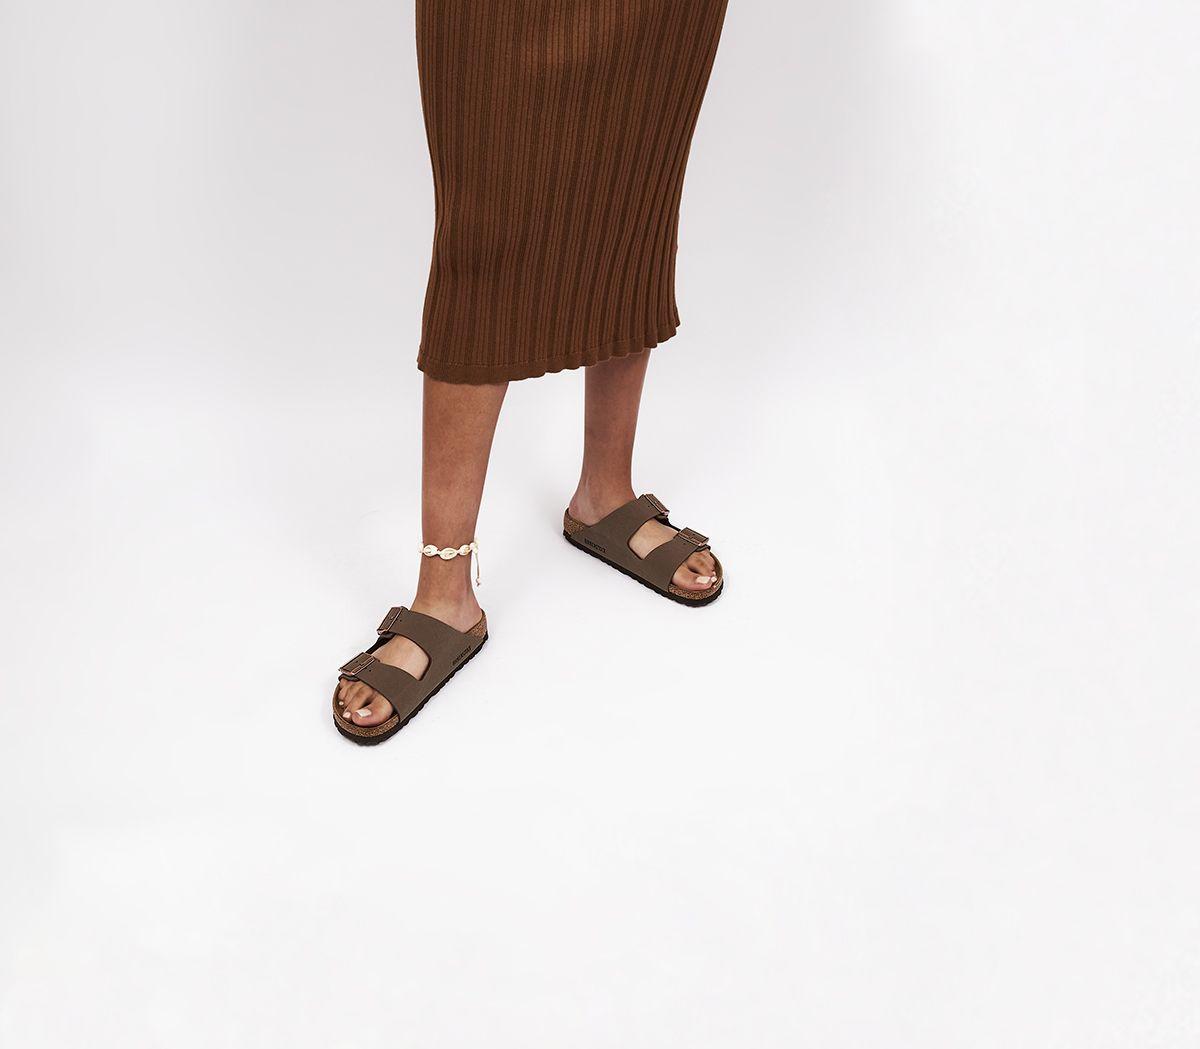 60d0685f7 Birkenstock Arizona Two Strap Sandals Mocha Birko Flor - Sandals